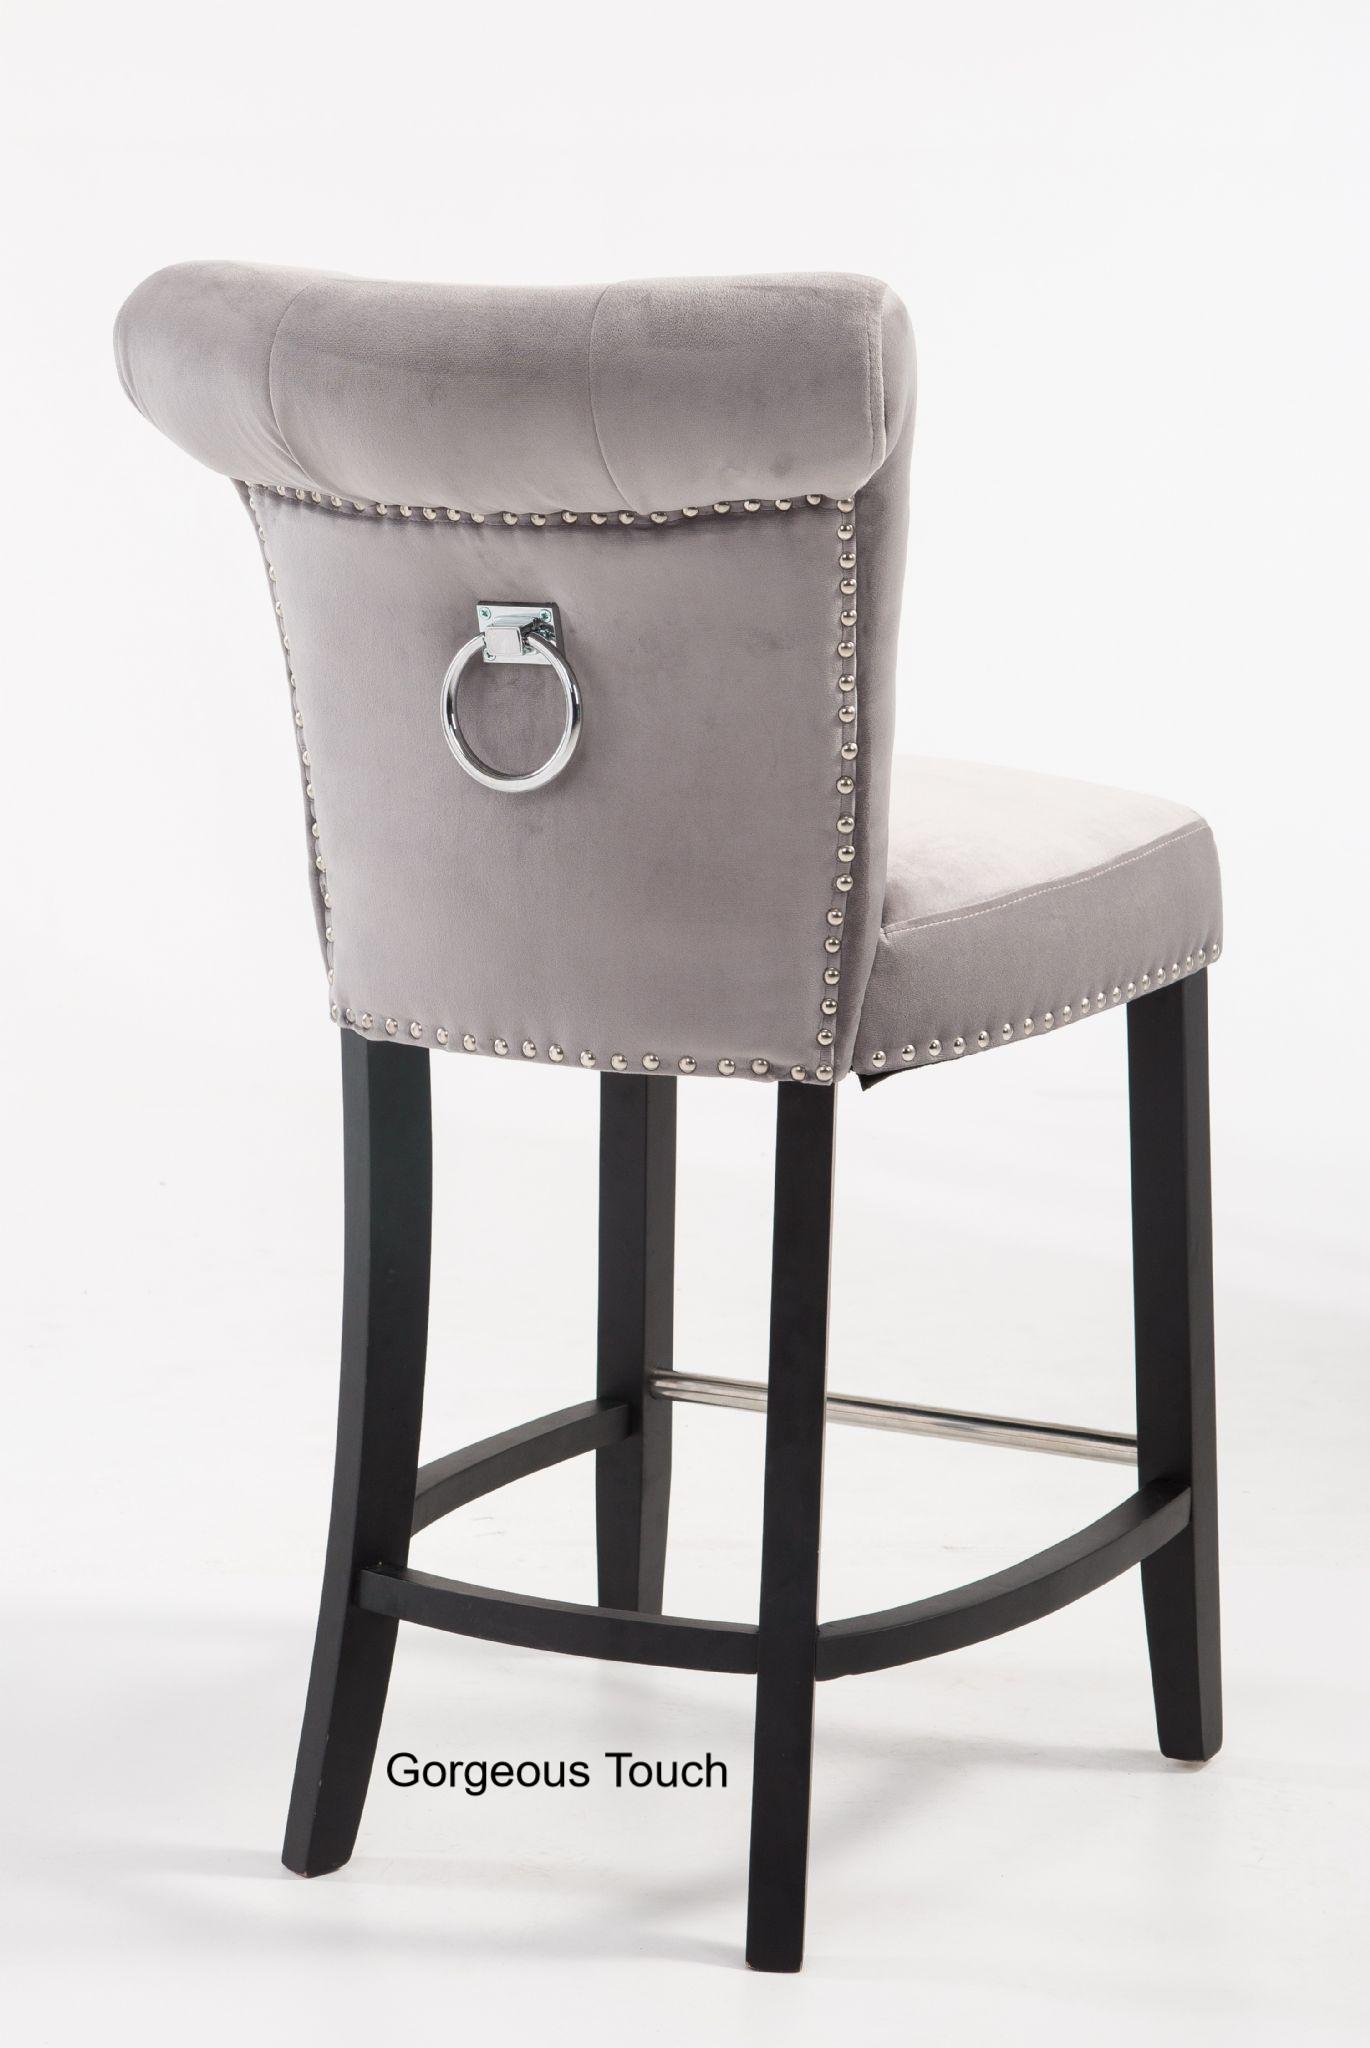 Breakfast bar stool gray bar stool - gray velvet breakfast bar stool XDCJBWN